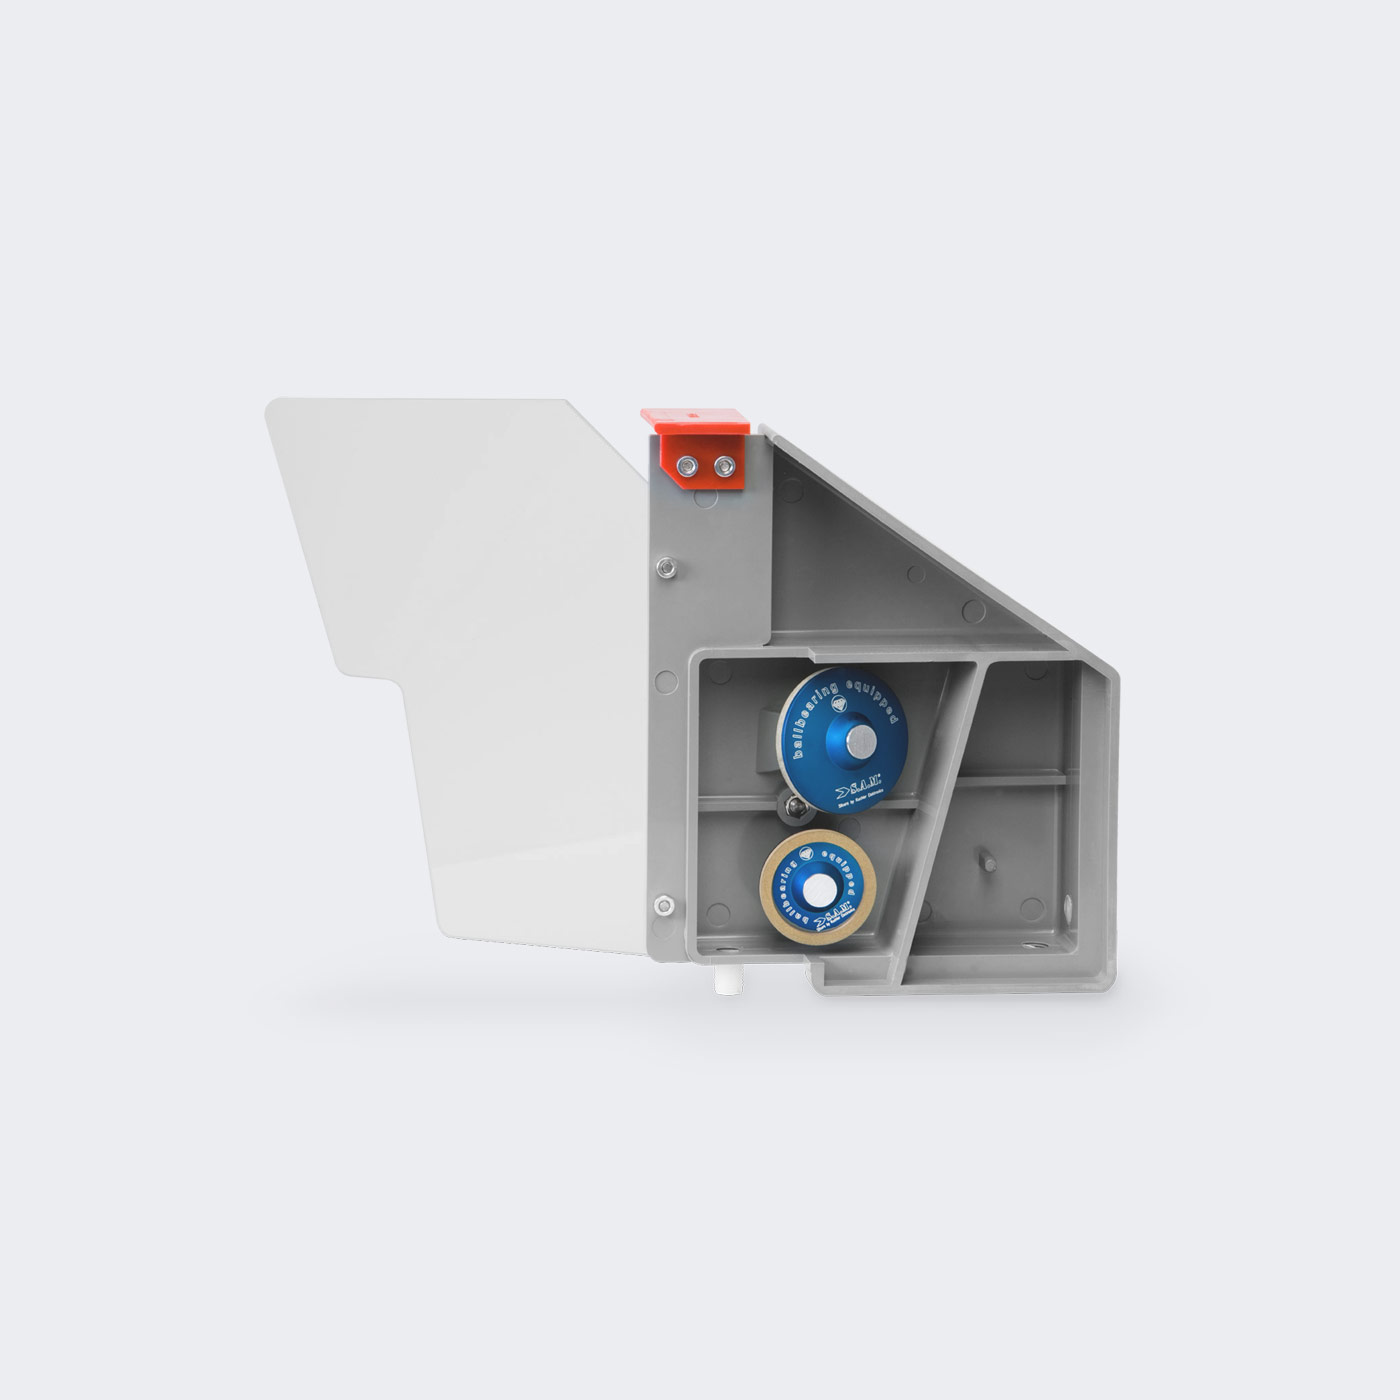 Diamantschleifapparat   S.A.M. KUCHLER Electronics GmbH